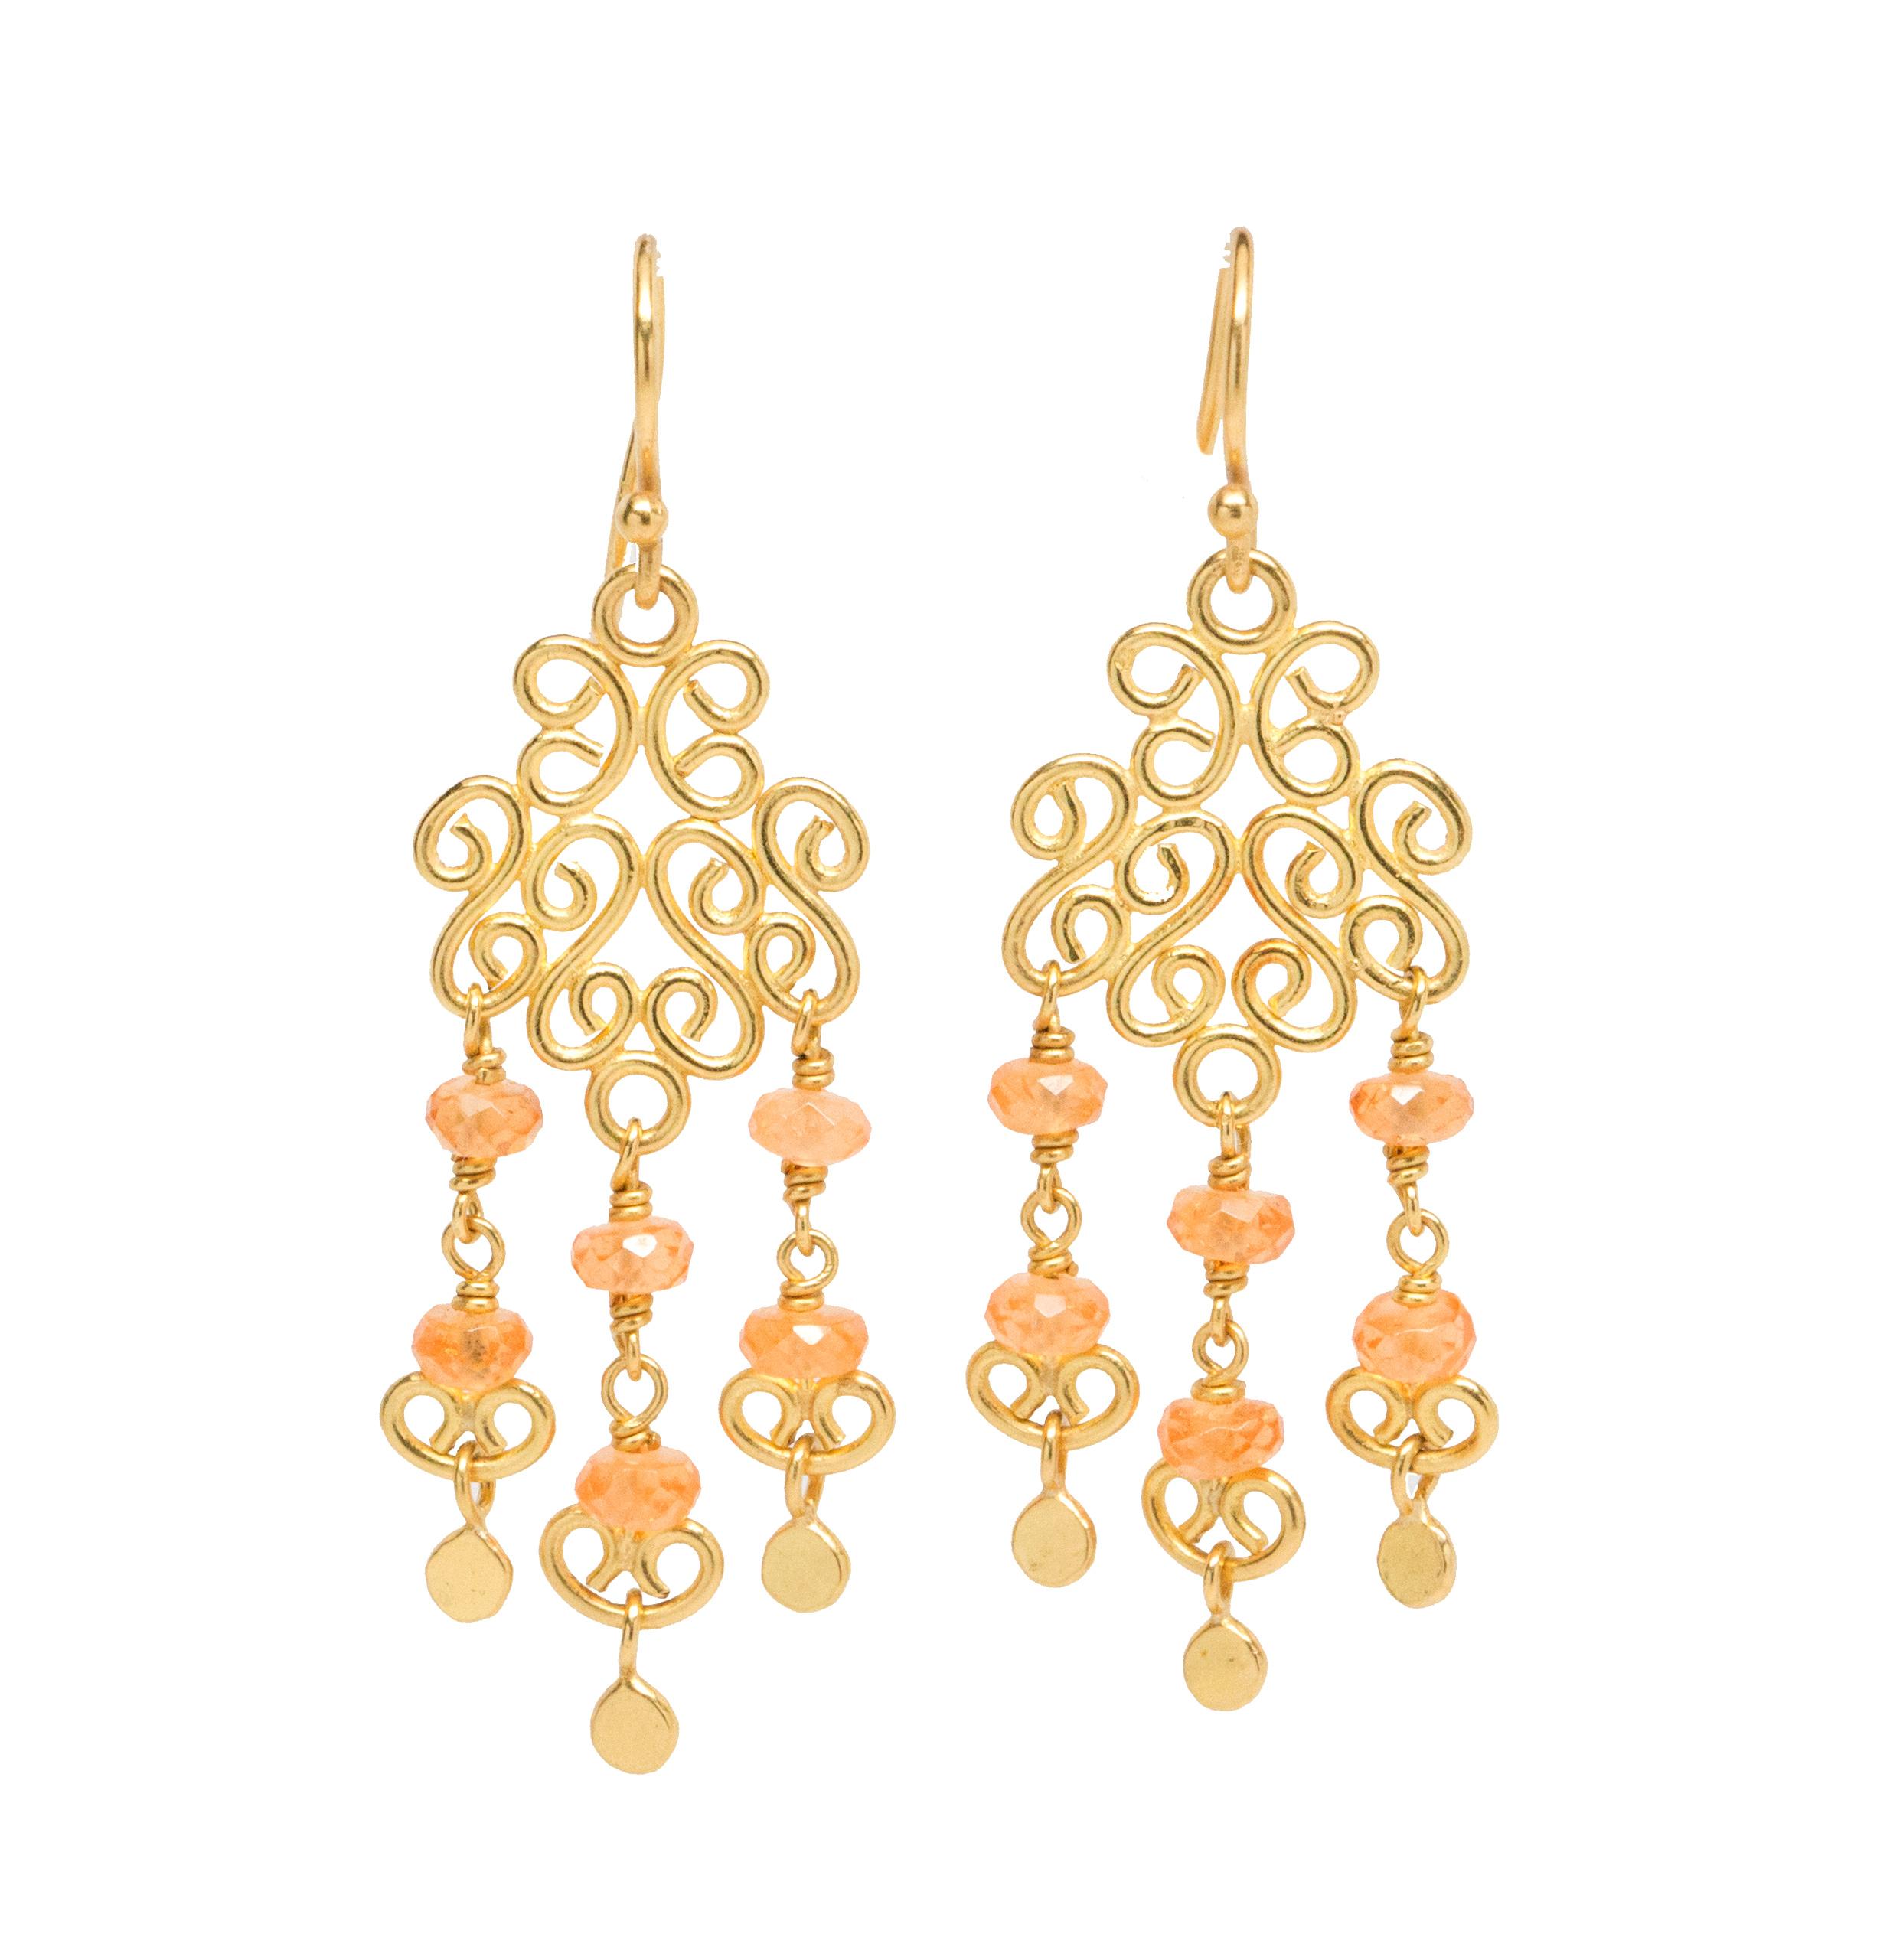 dec19 jewelry2-258.jpg